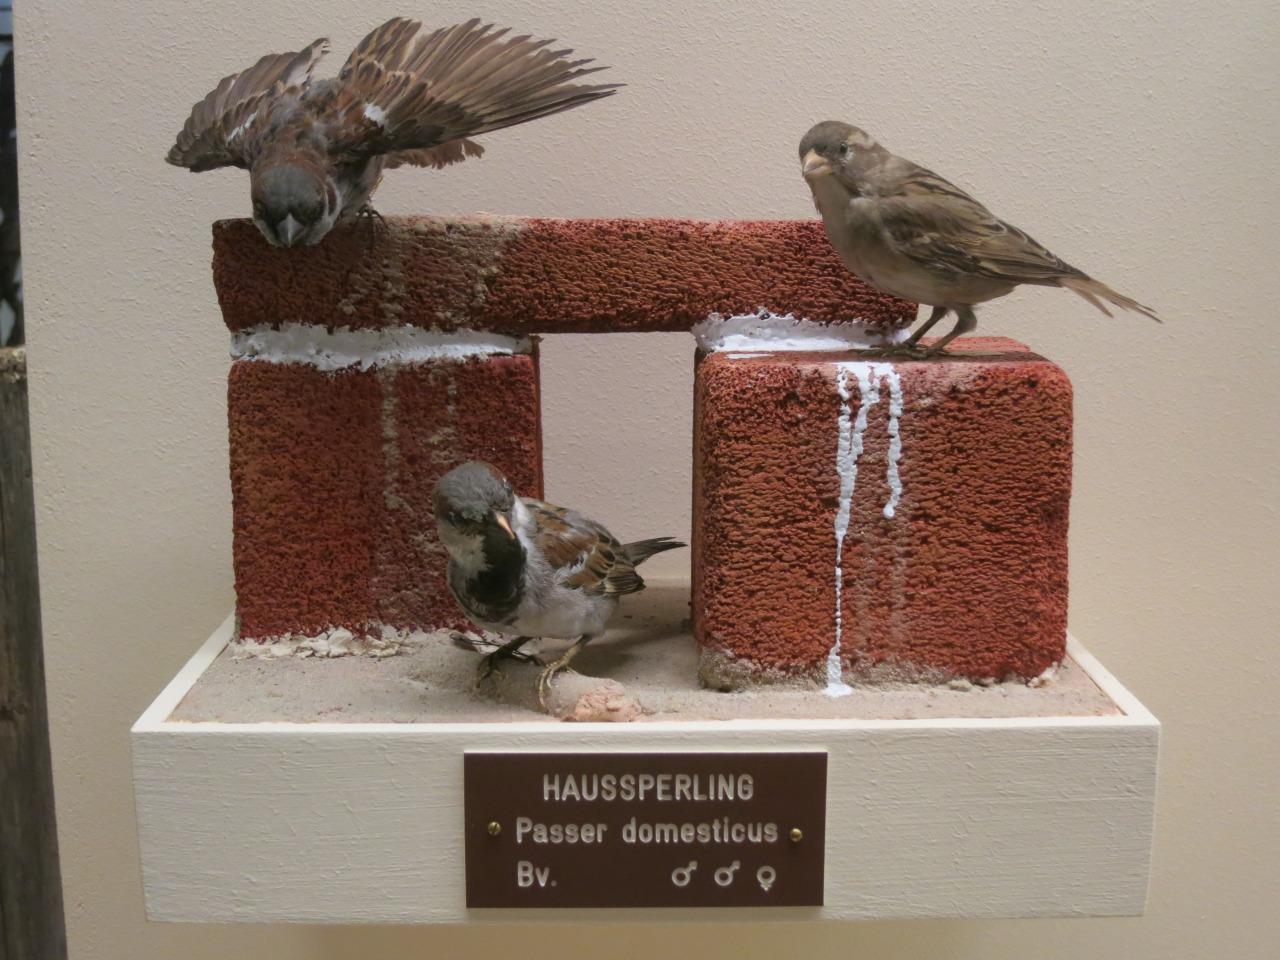 Naturhistorisches Museum Wien 4.14.13